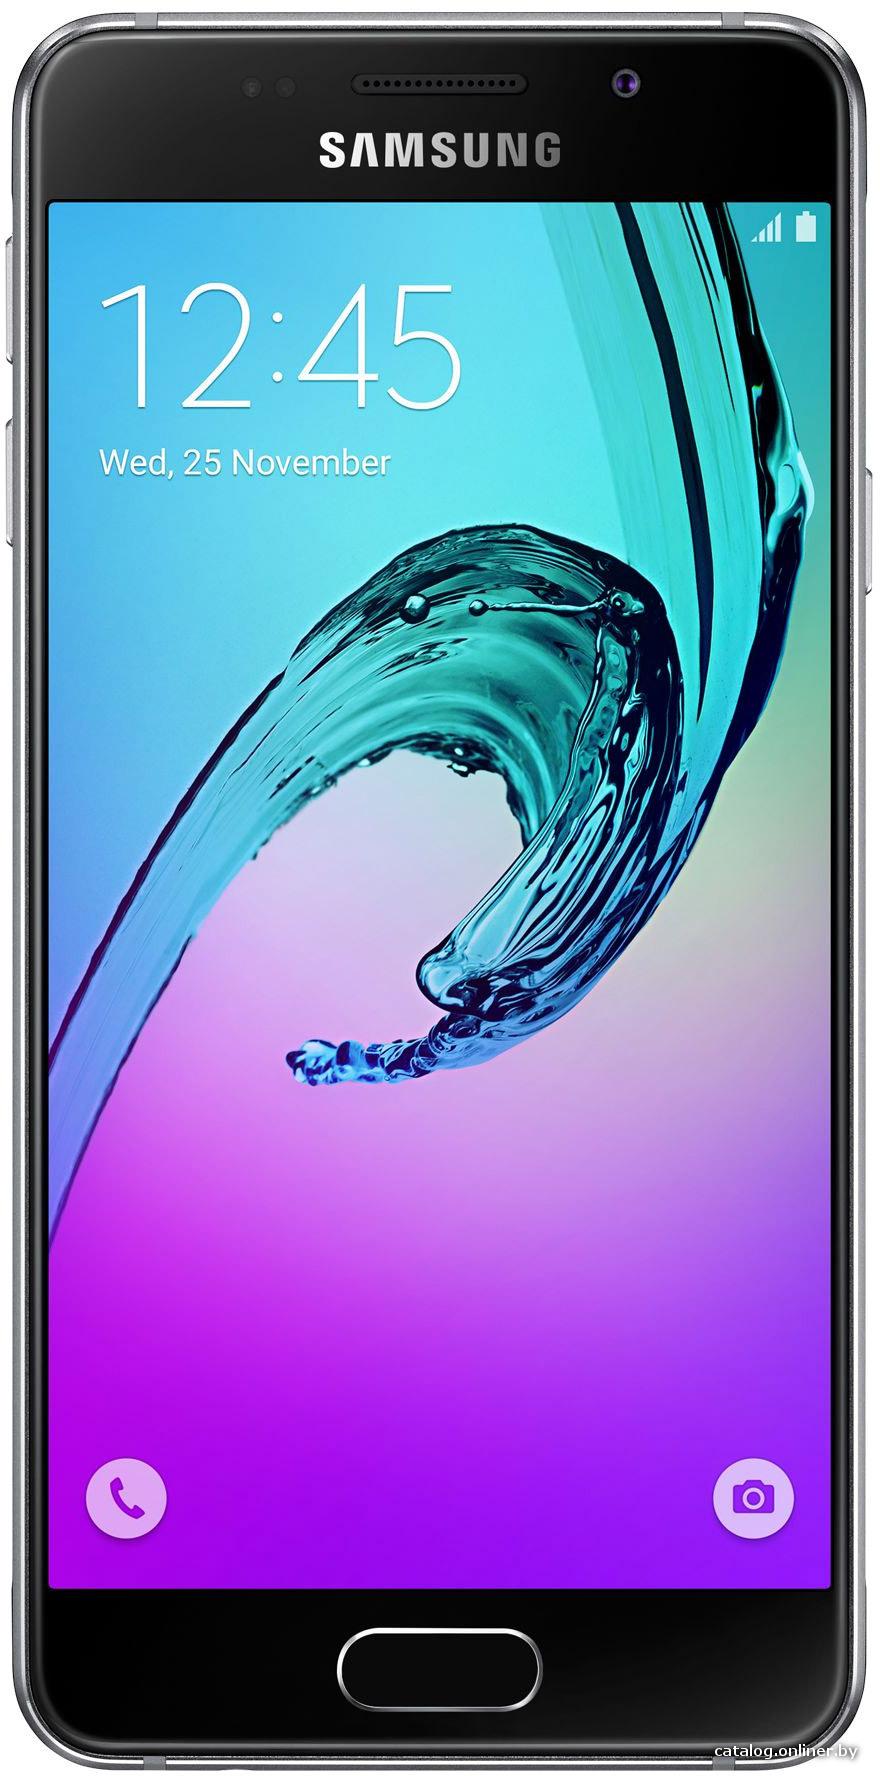 "Смартфон Samsung Galaxy A3 (2016) SM-A310F-DS Black (1.5GHz,1.5GbRAM,4.7""1280x720,4G+BT+WiFi+GPS,16Gb+microSD,13Mp,Andr)"